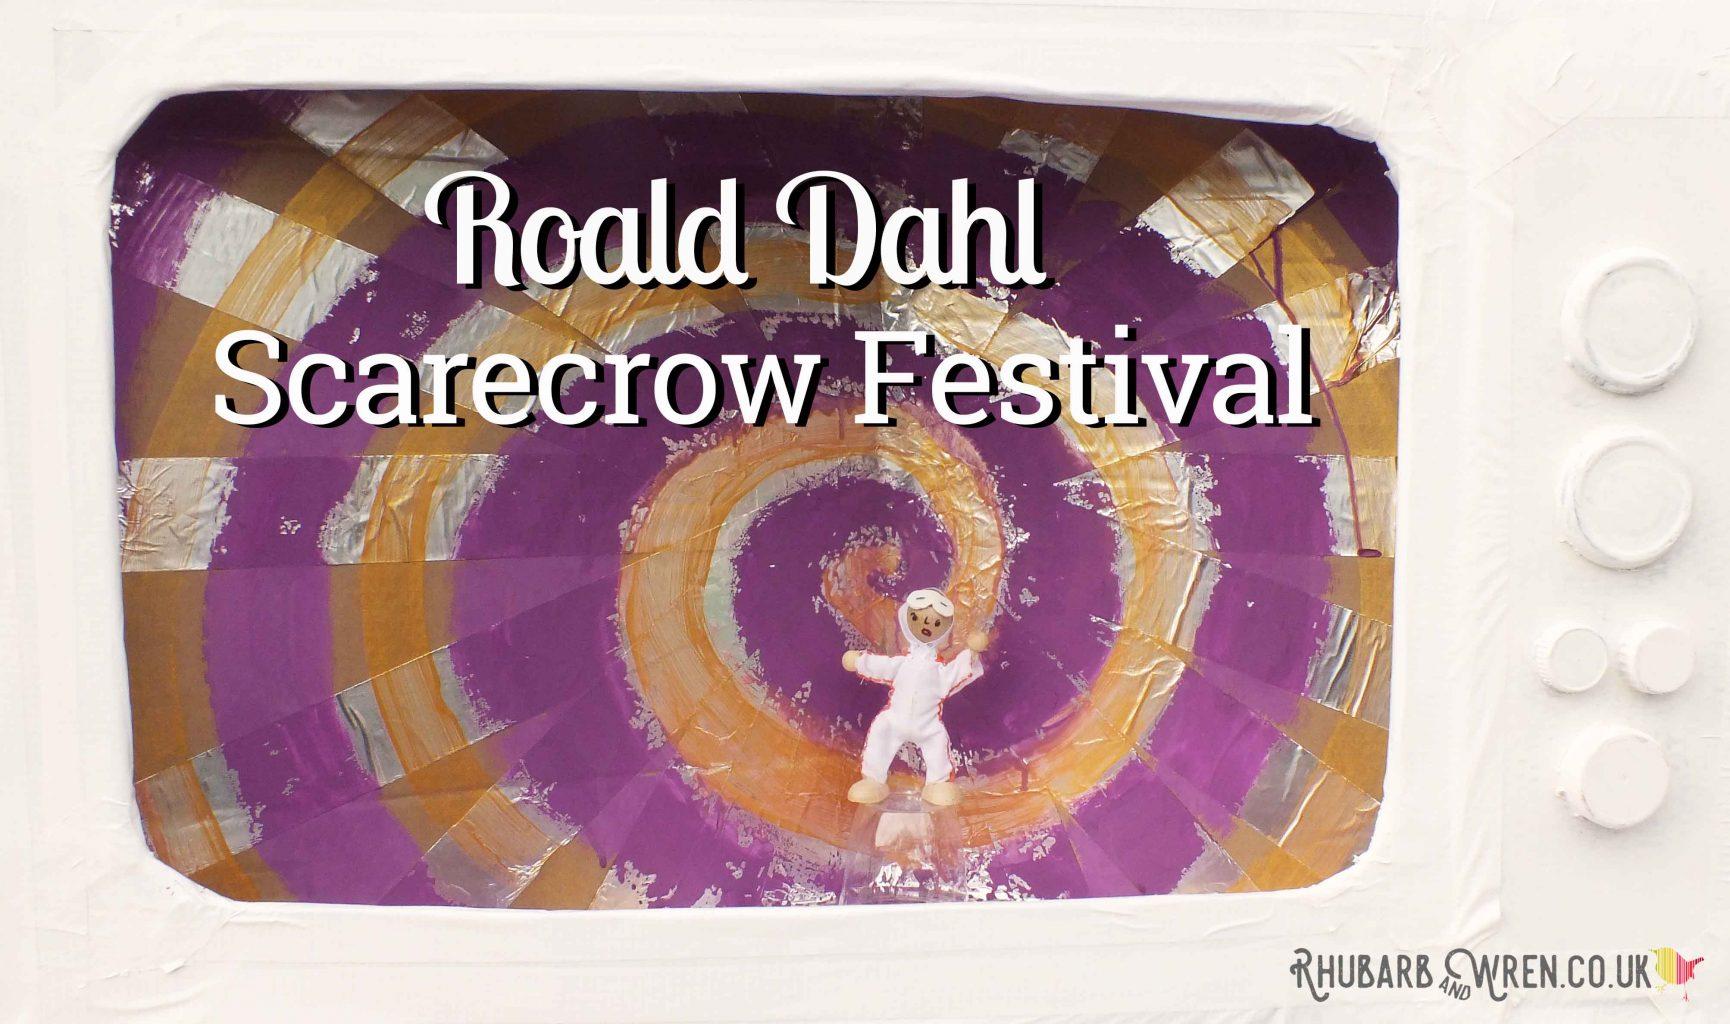 Mike Teavee inside TV set - Roald Dahl scarecrow